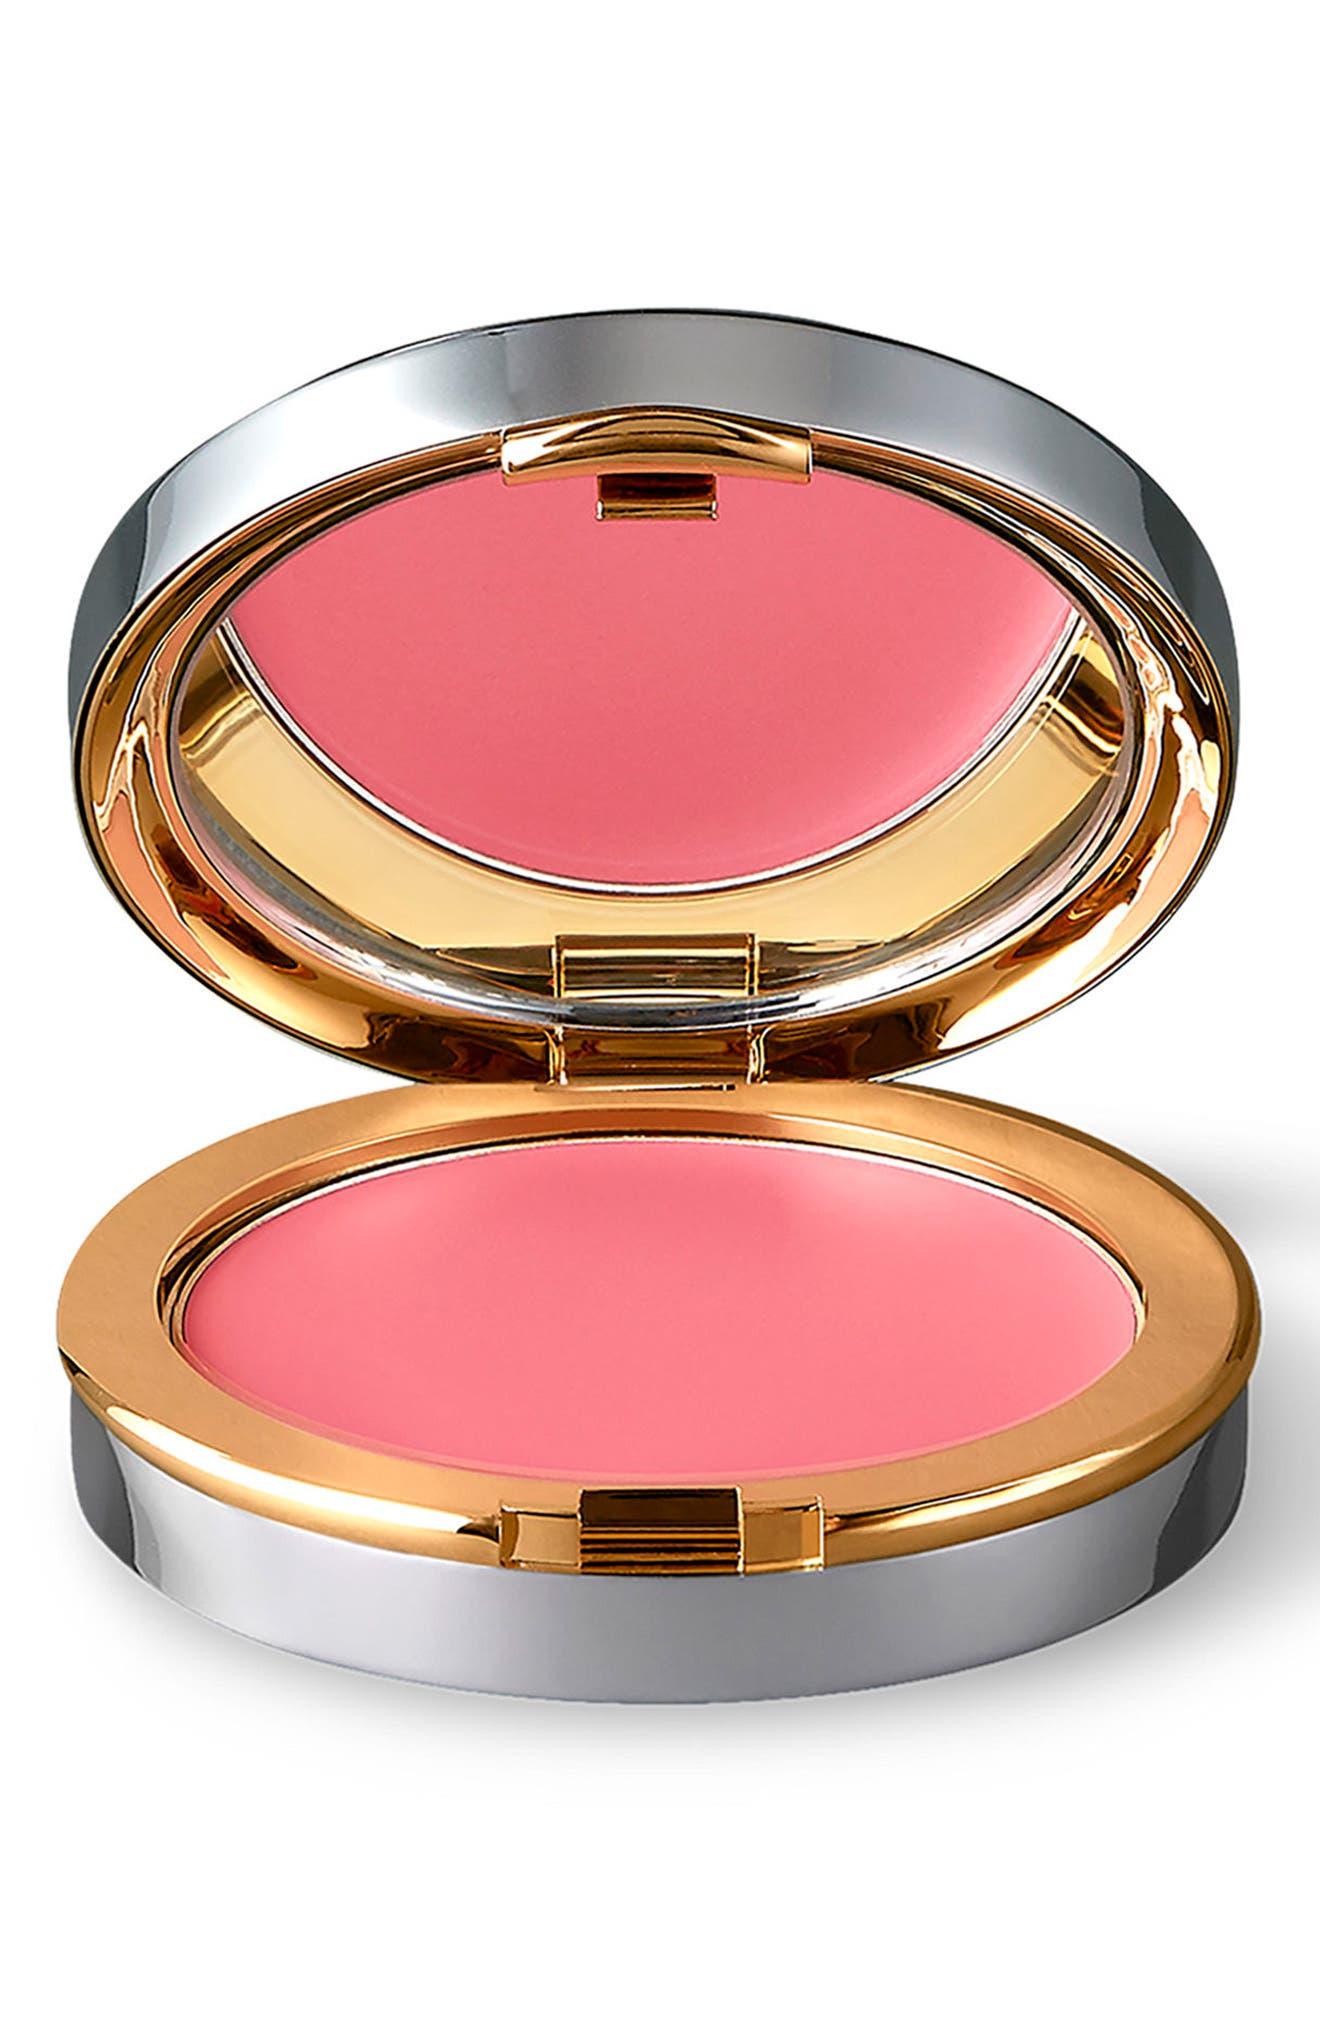 Alternate Image 1 Selected - La Prairie Cellular Radiance Cream Blush